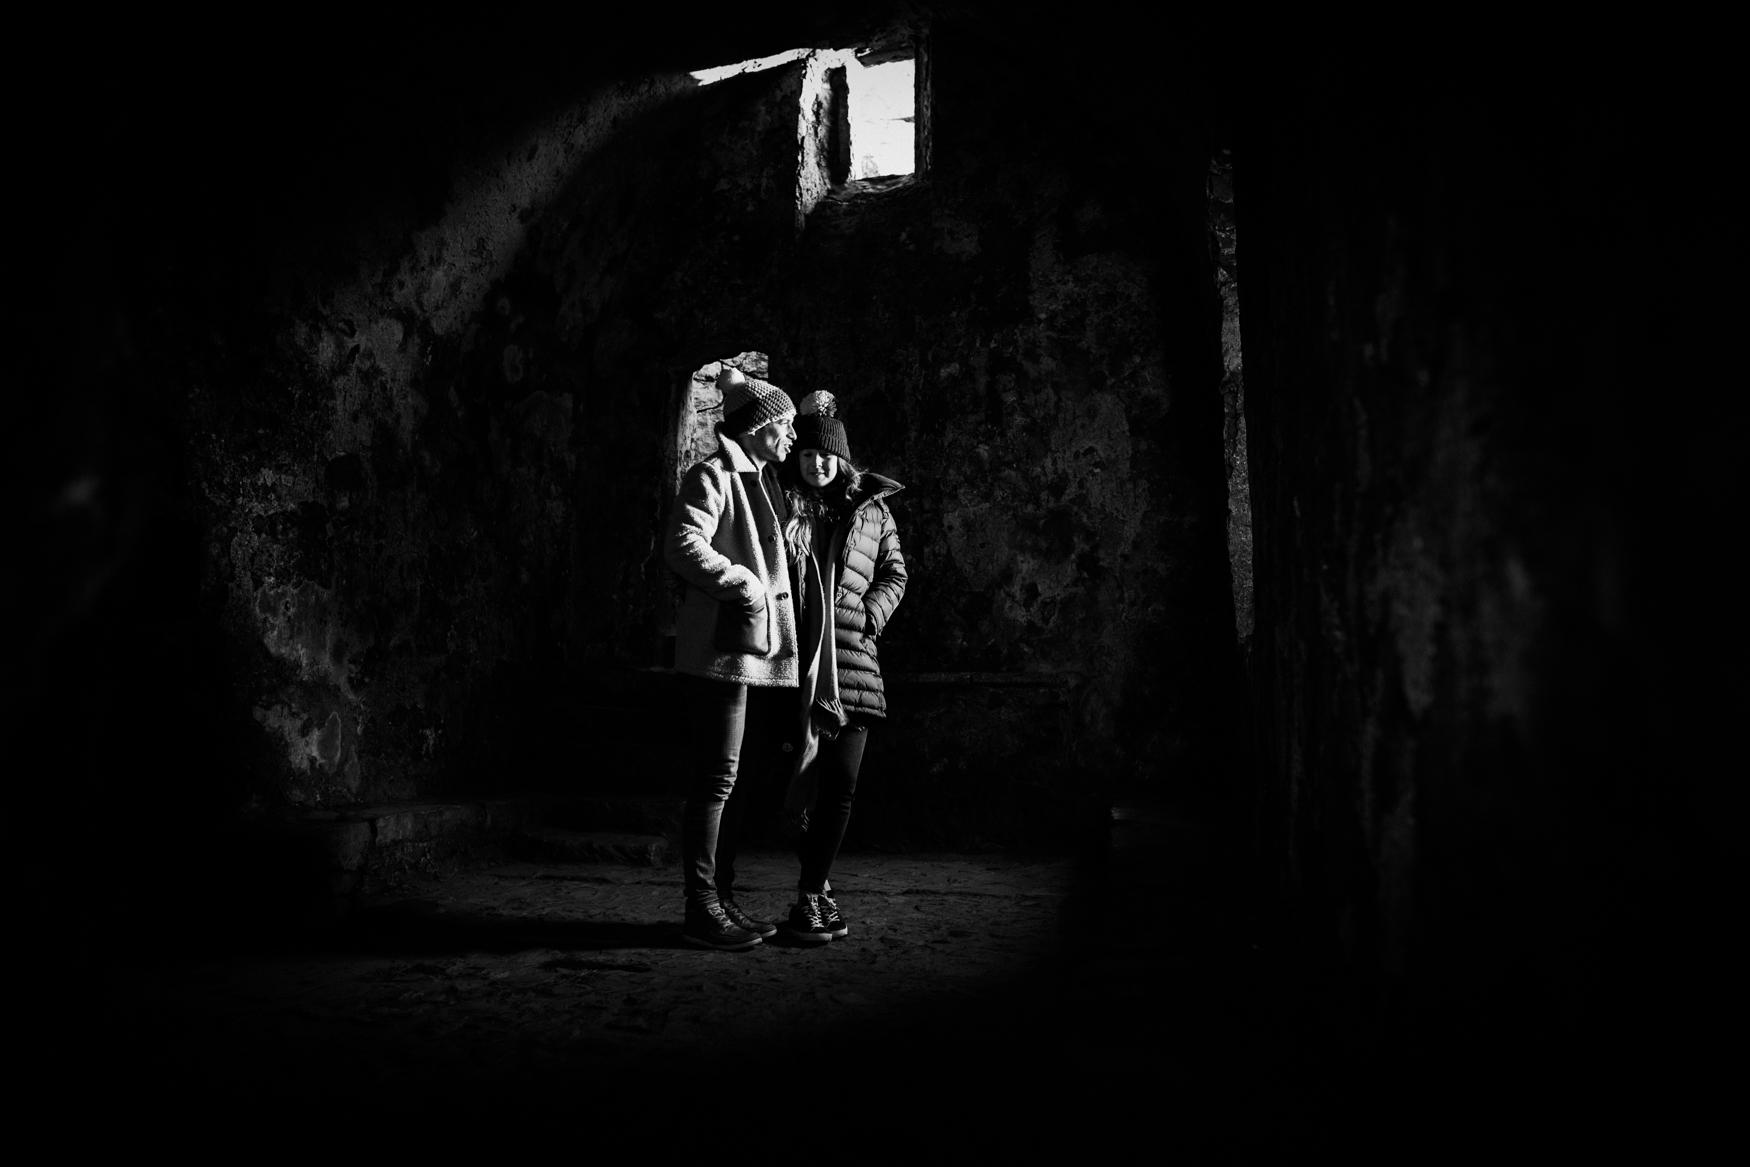 Alex-Sedgmond-Photography-Cardiff-Prewedding-Photography-Castlemartin-Pembrokeshire-WestWales-6.JPG